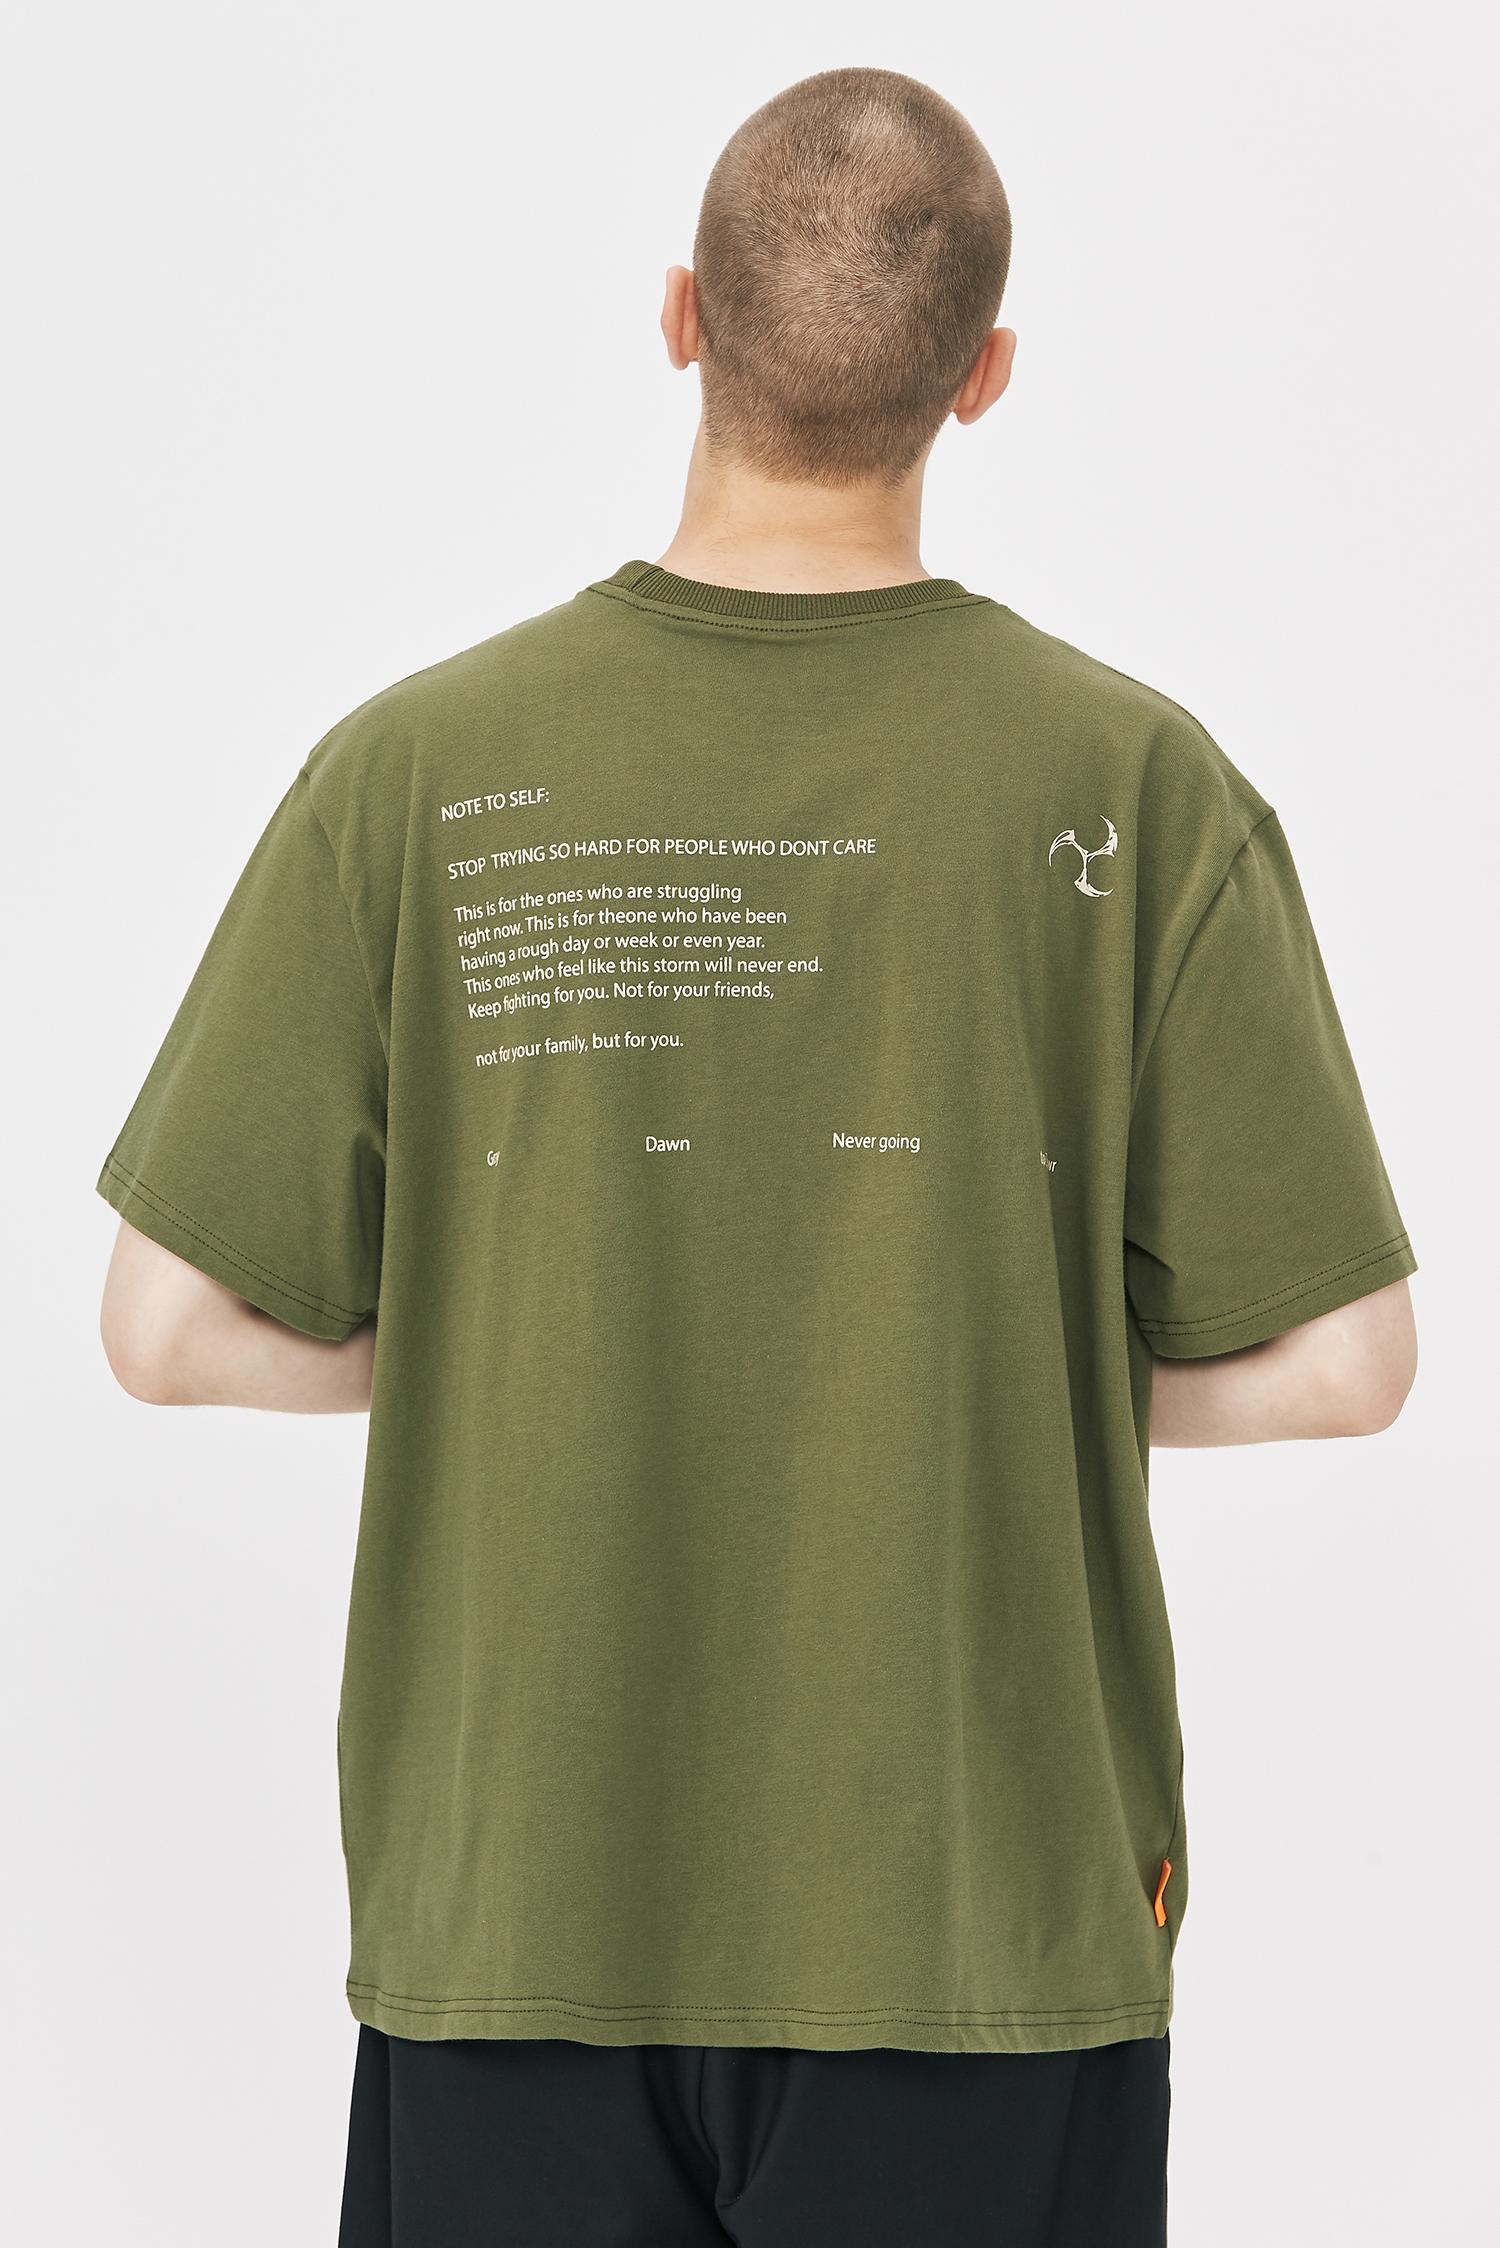 GRINCH1928「GAHA」美式复古英文印花短袖T恤男女宽松休闲半袖Tee(【GAHA】美式复古英文印花短袖T恤)